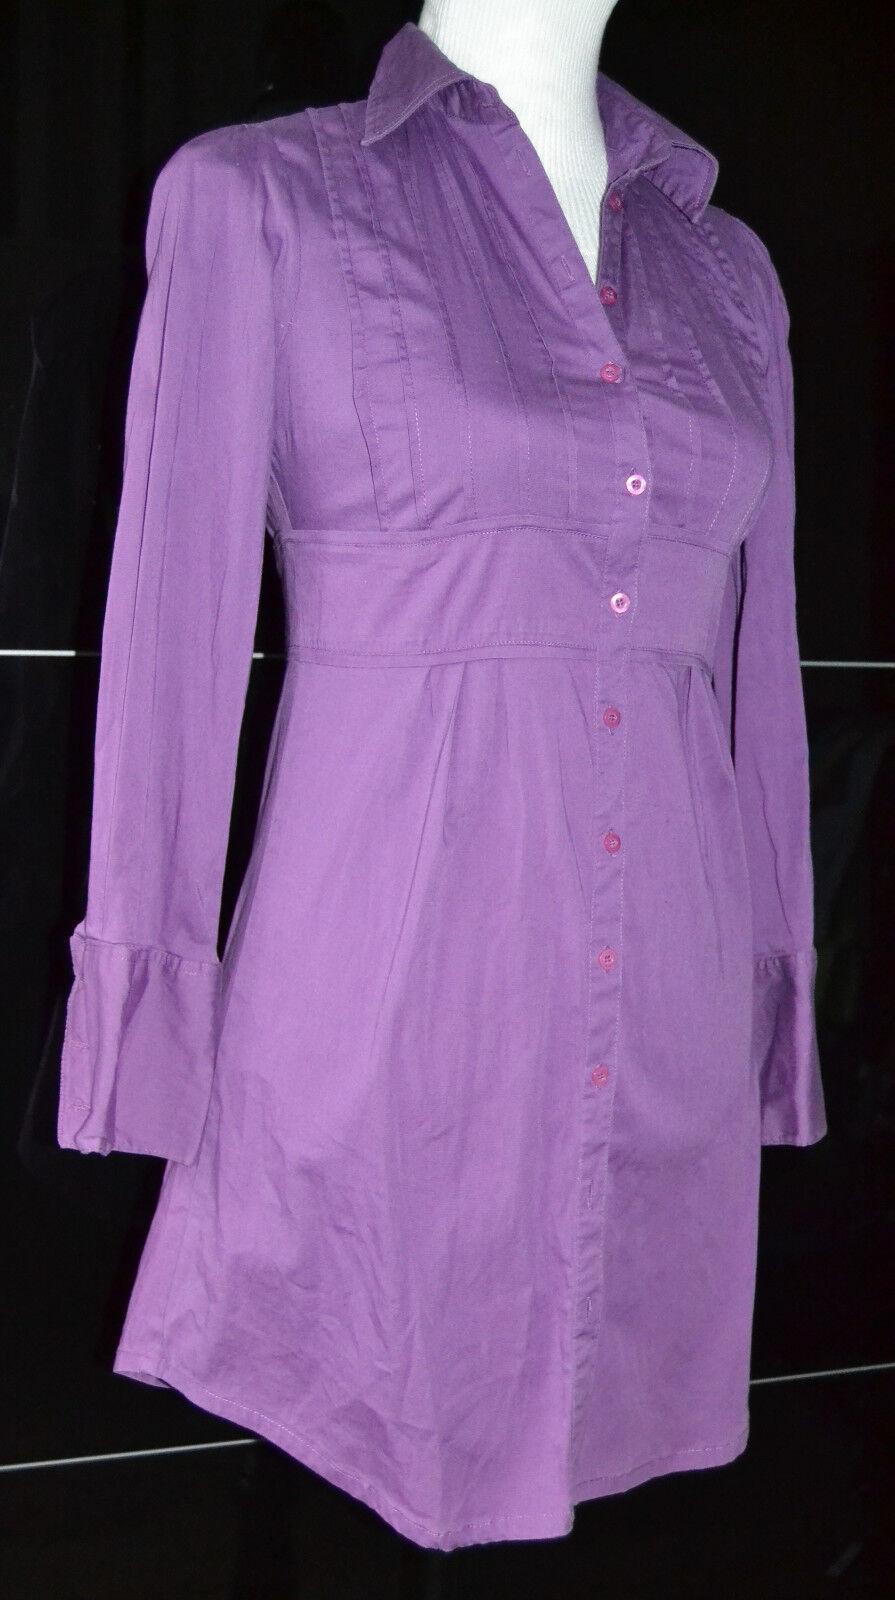 FLASH LIGHTS Damen Mädchen Hemdkleid Stretch Kleid lila 36 wie Neu